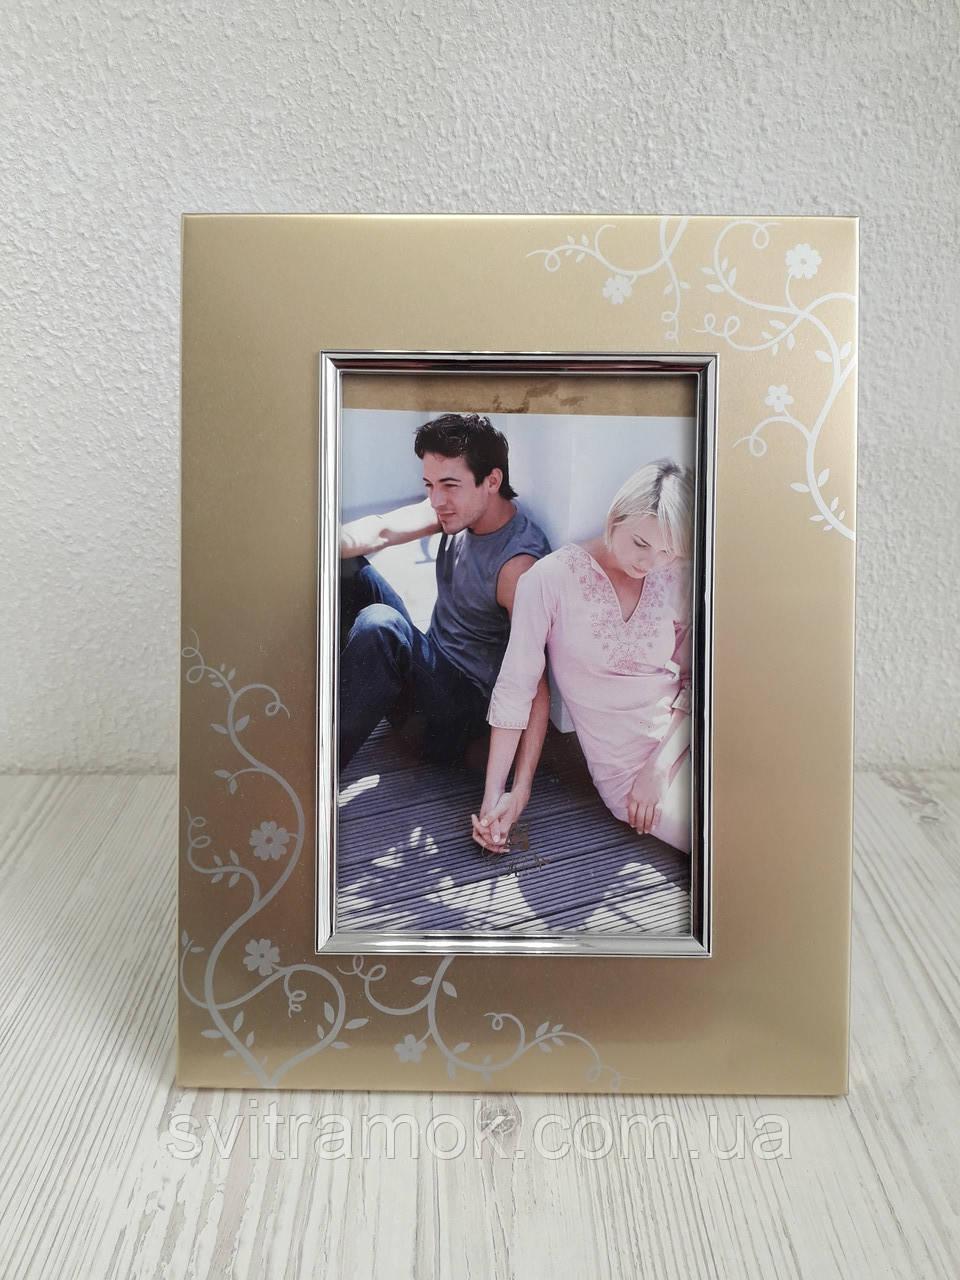 Рамка для фото закоханих з металу 10х15 см